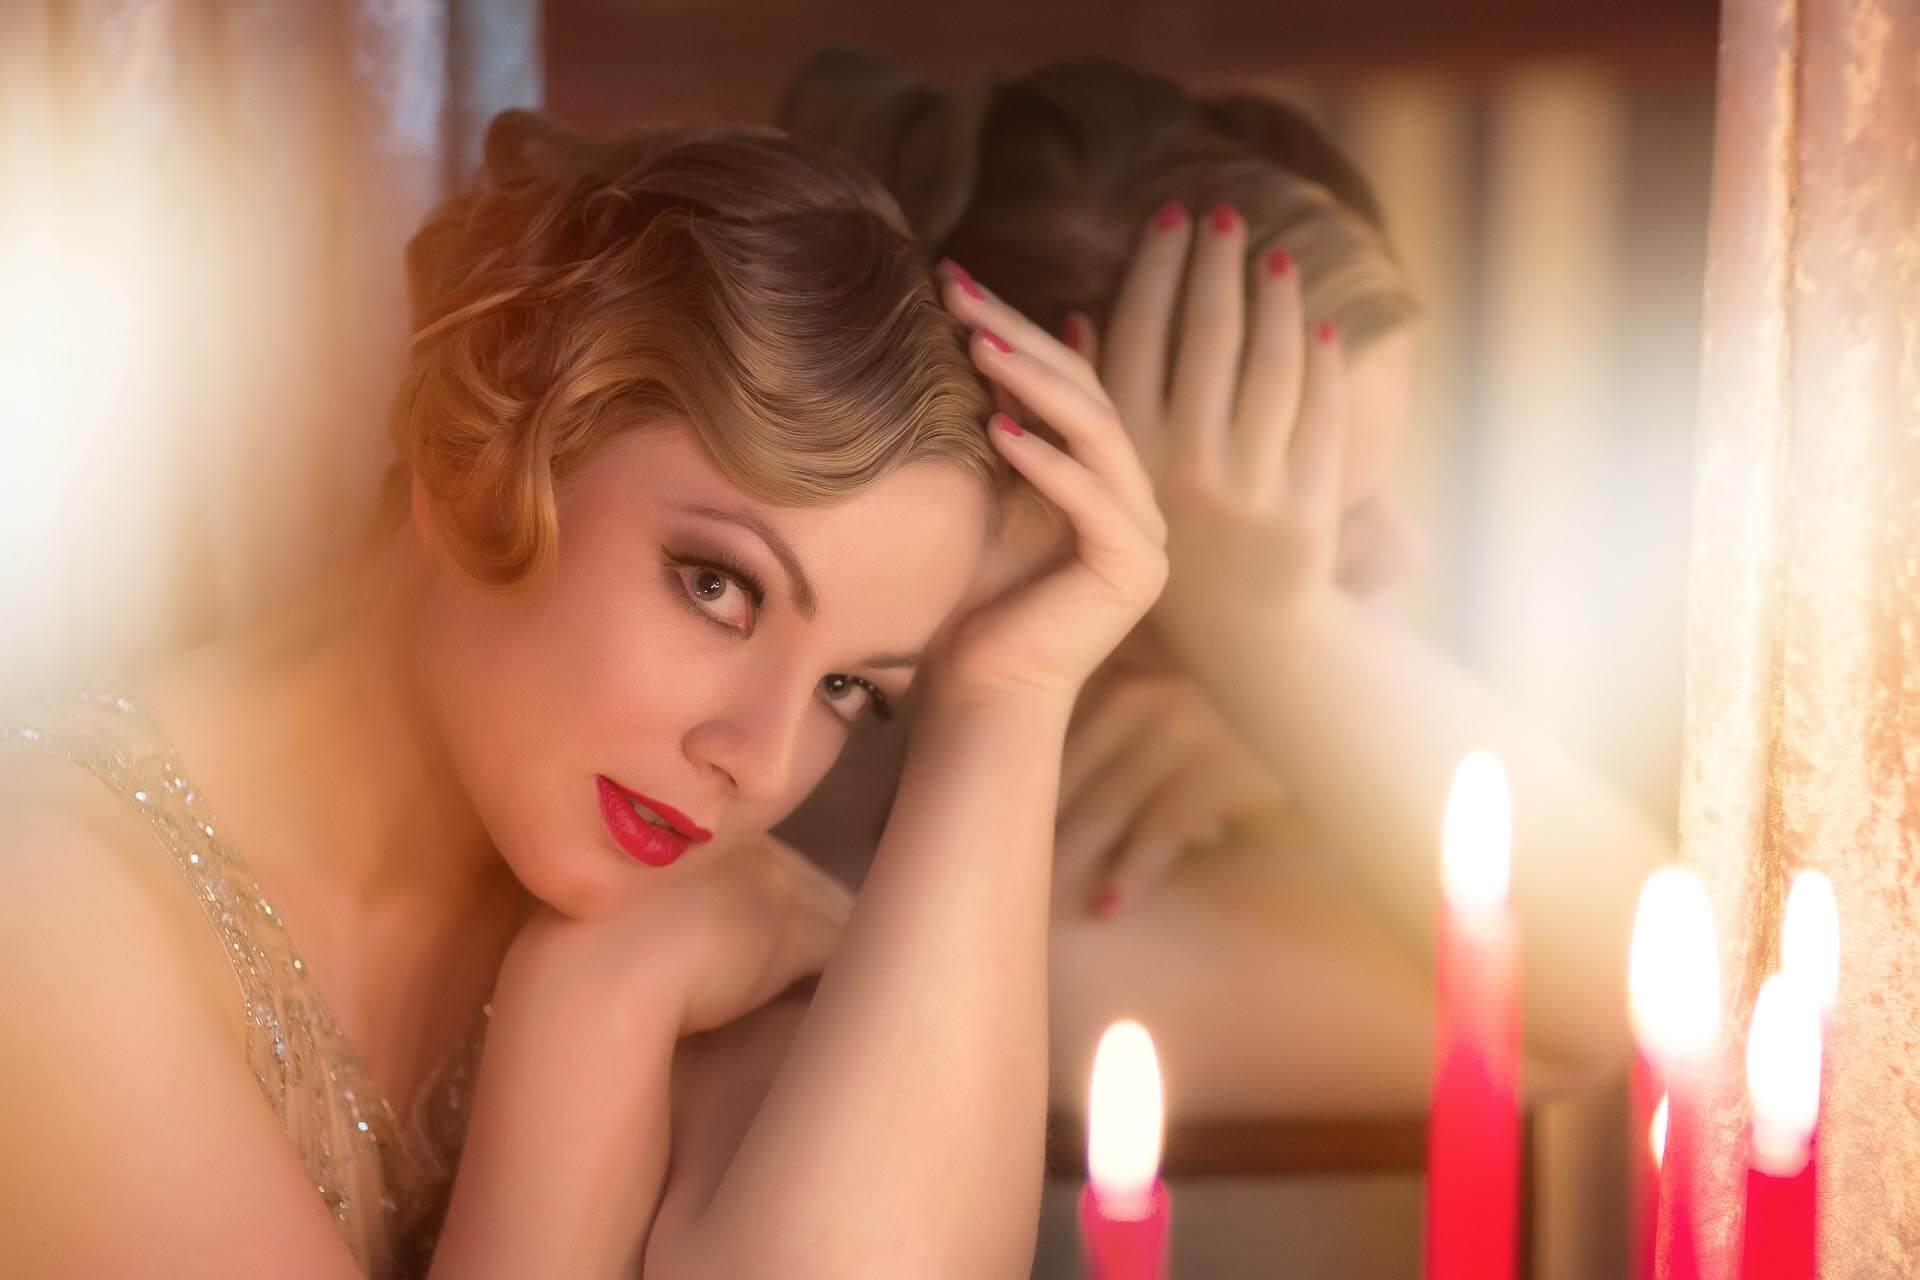 Fotostudio-Dresden-Fotograf-20iger Jahre-Shooting-Dress-Spiegel-Candles-Kerzen